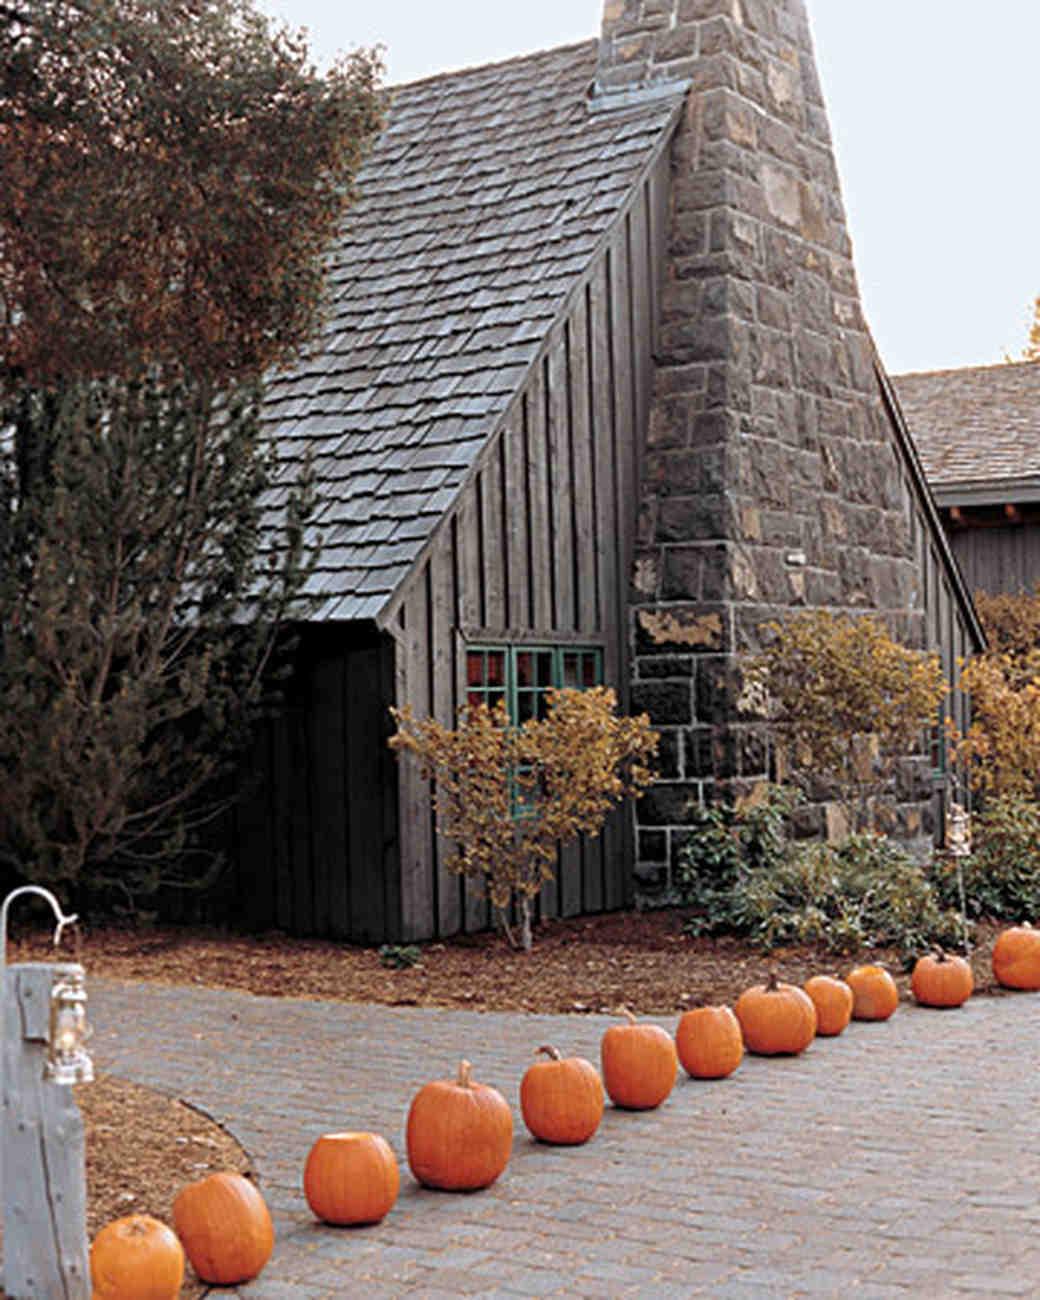 Pumpkin-Lined Walkway